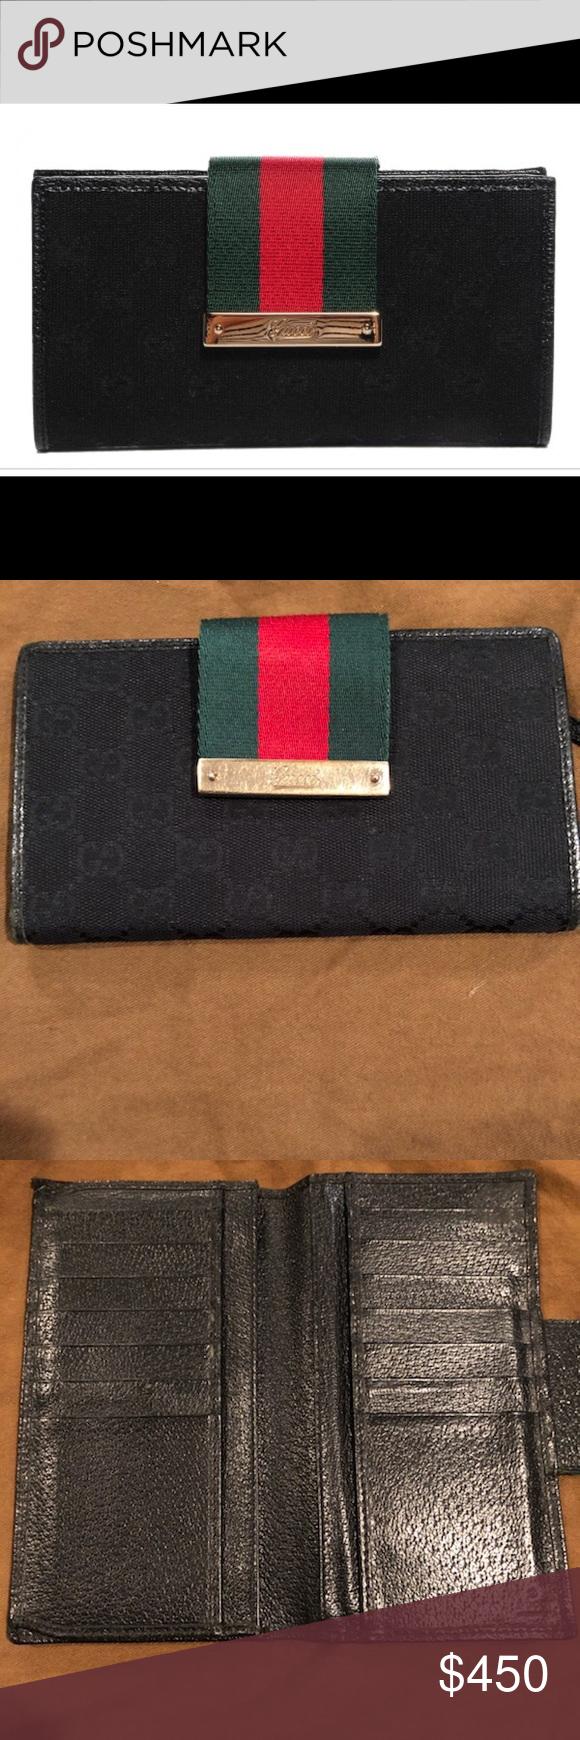 d20a3676d224 GUCCI Monogram Ladies Web Continental Wallet Black ❤️GUCCI Monogram Ladies  Web Continental Wallet Black Beautiful